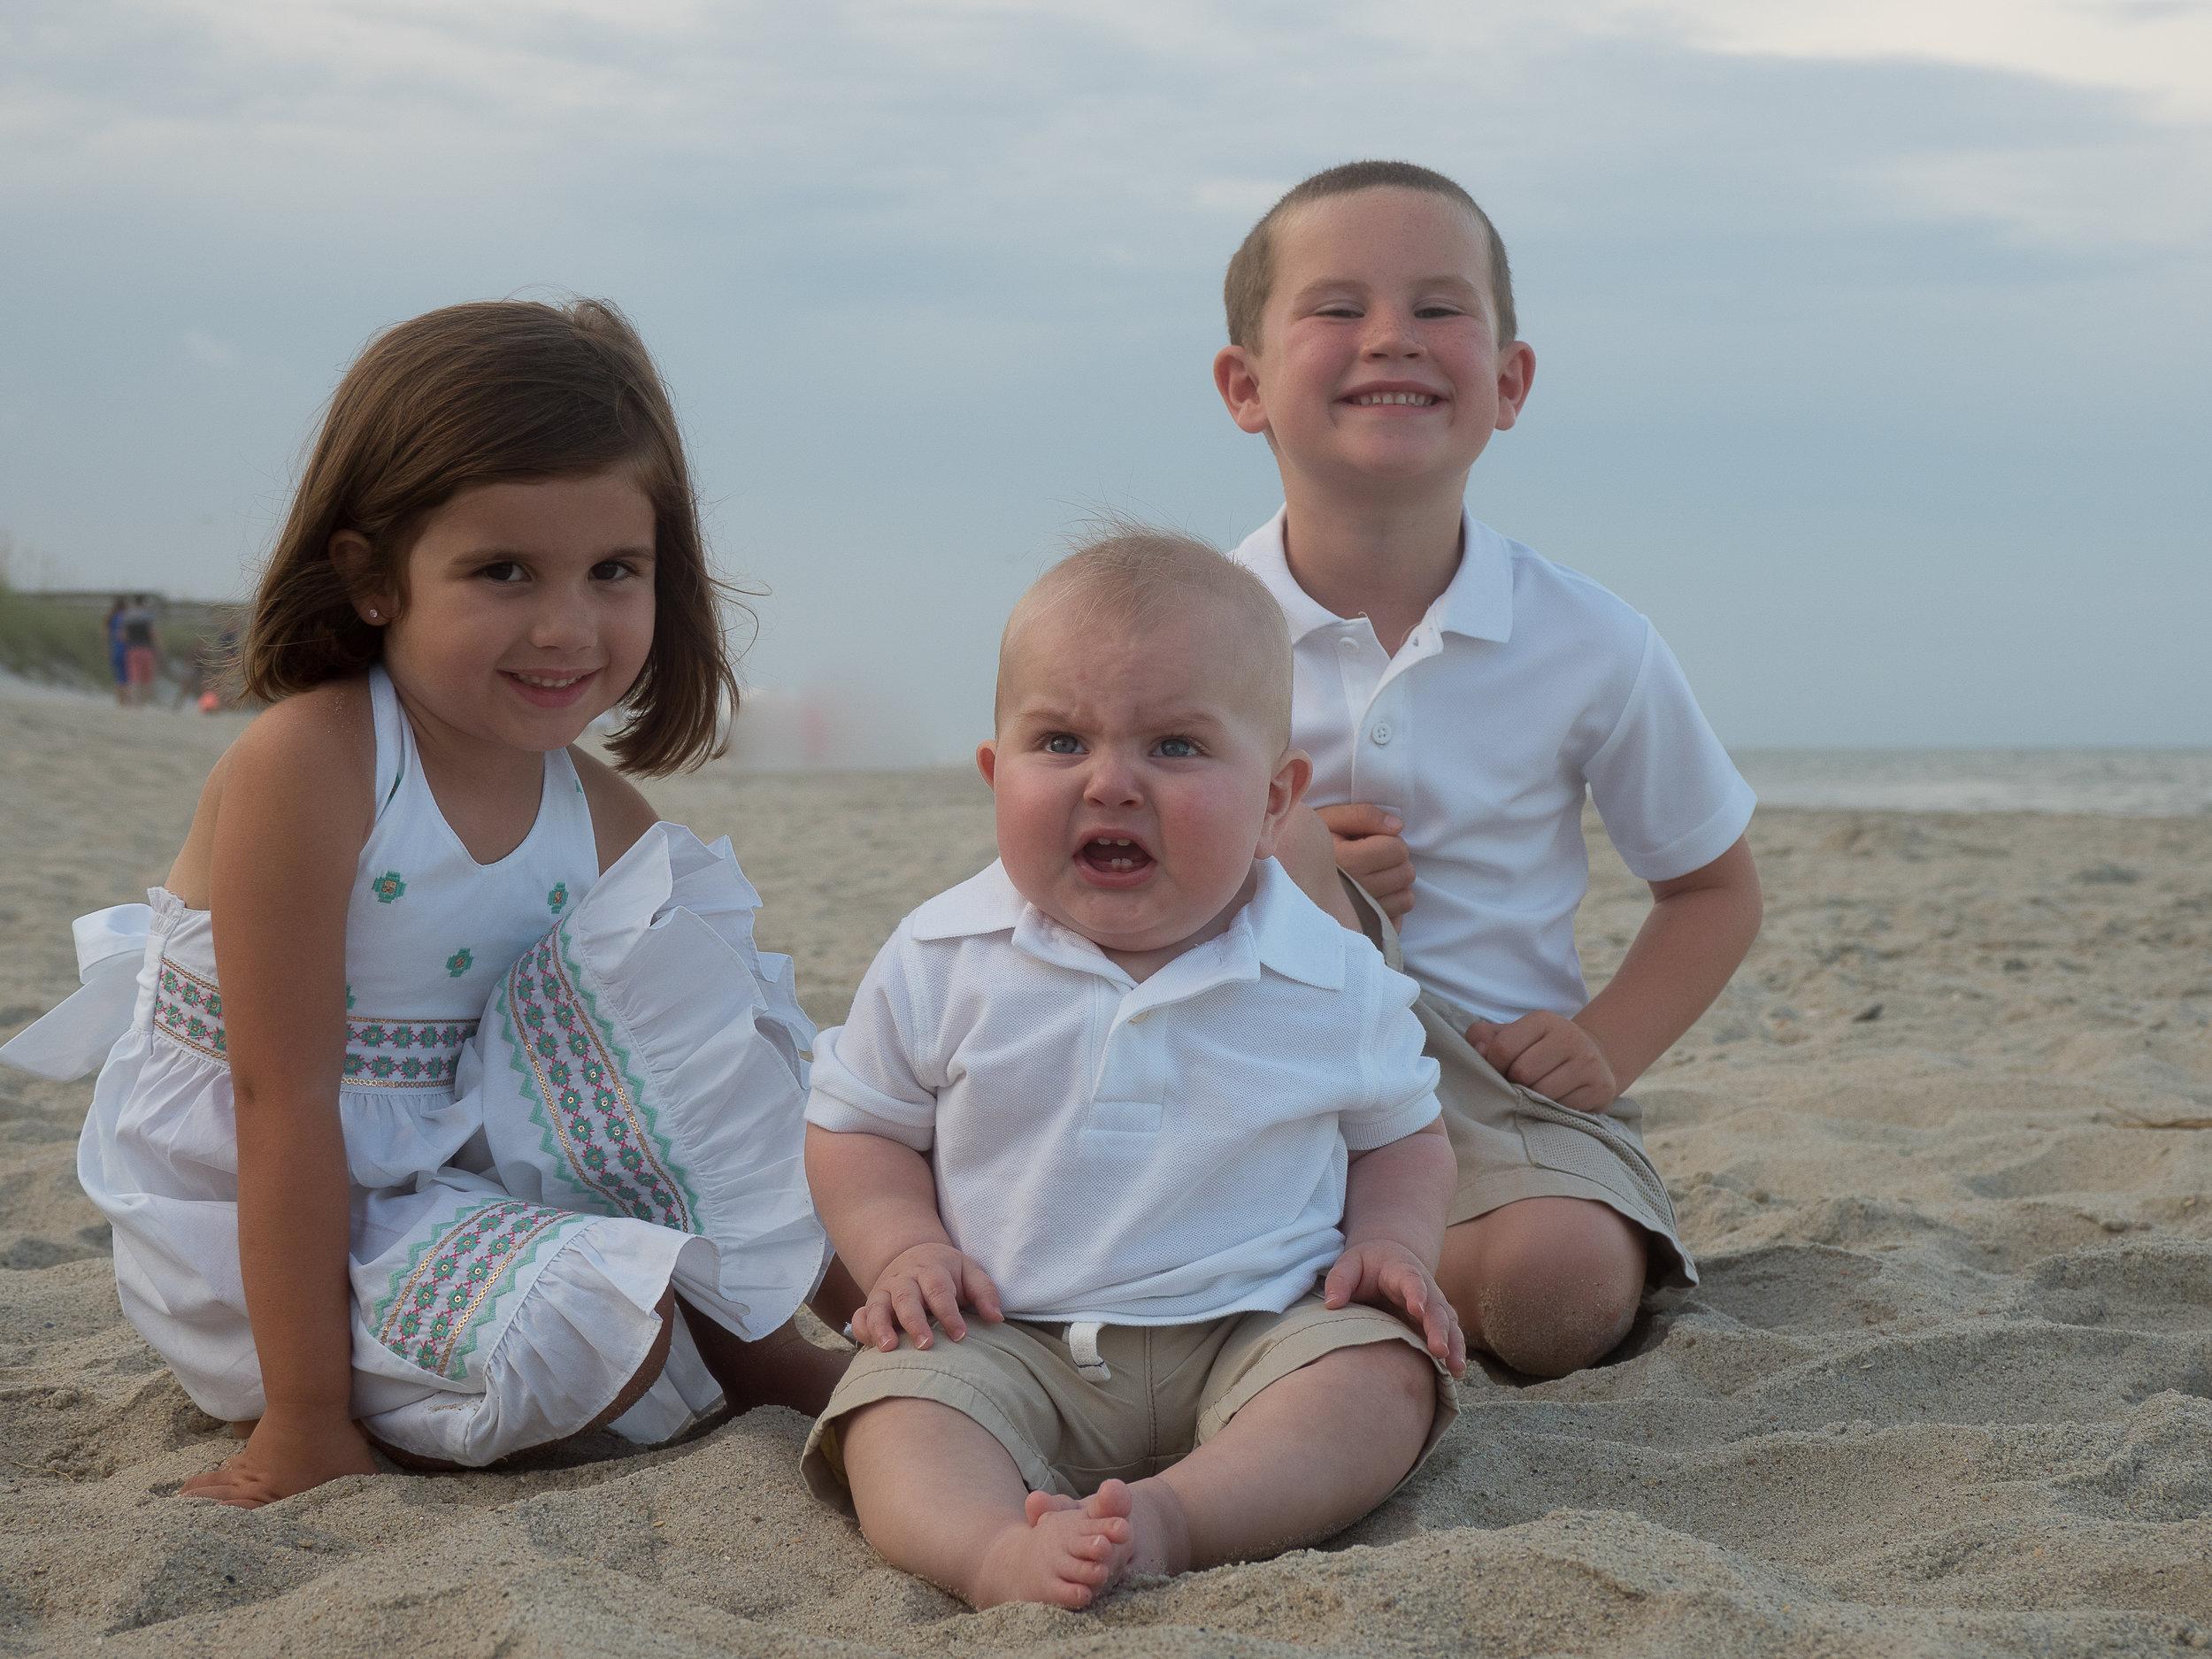 - I love this kid. What a great face! Carolina Beach, NC.